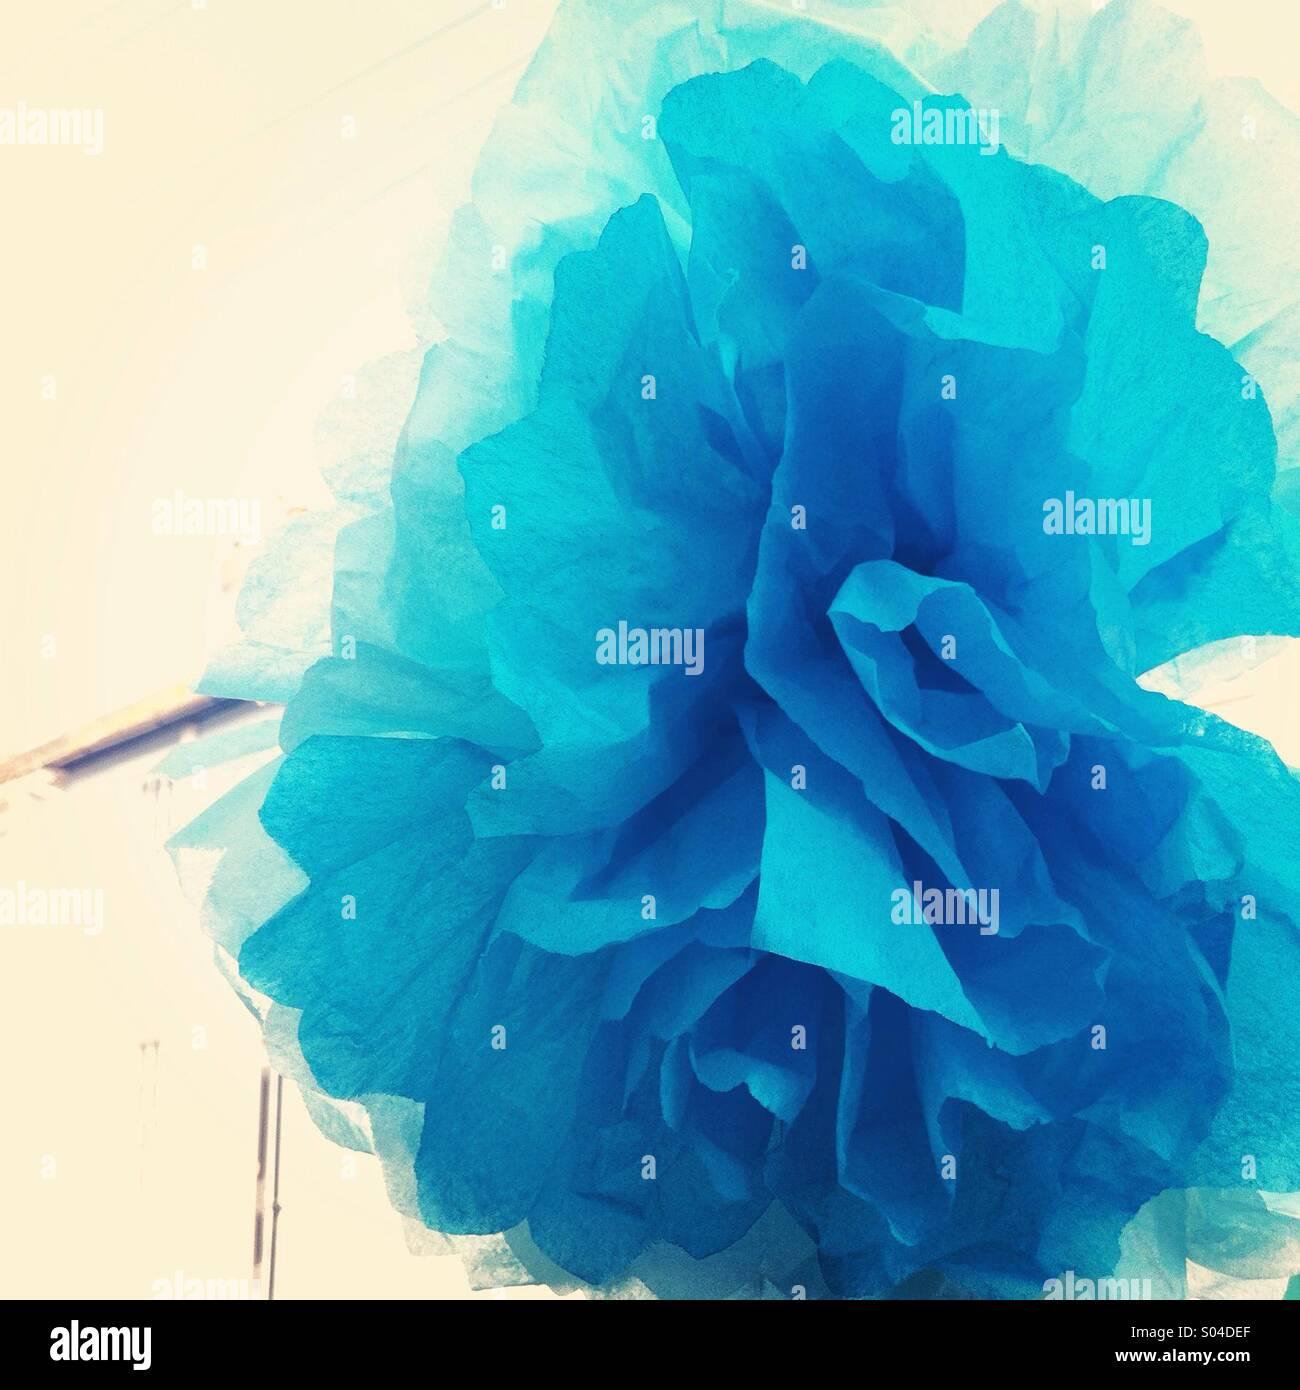 Blue paper flower - Stock Image